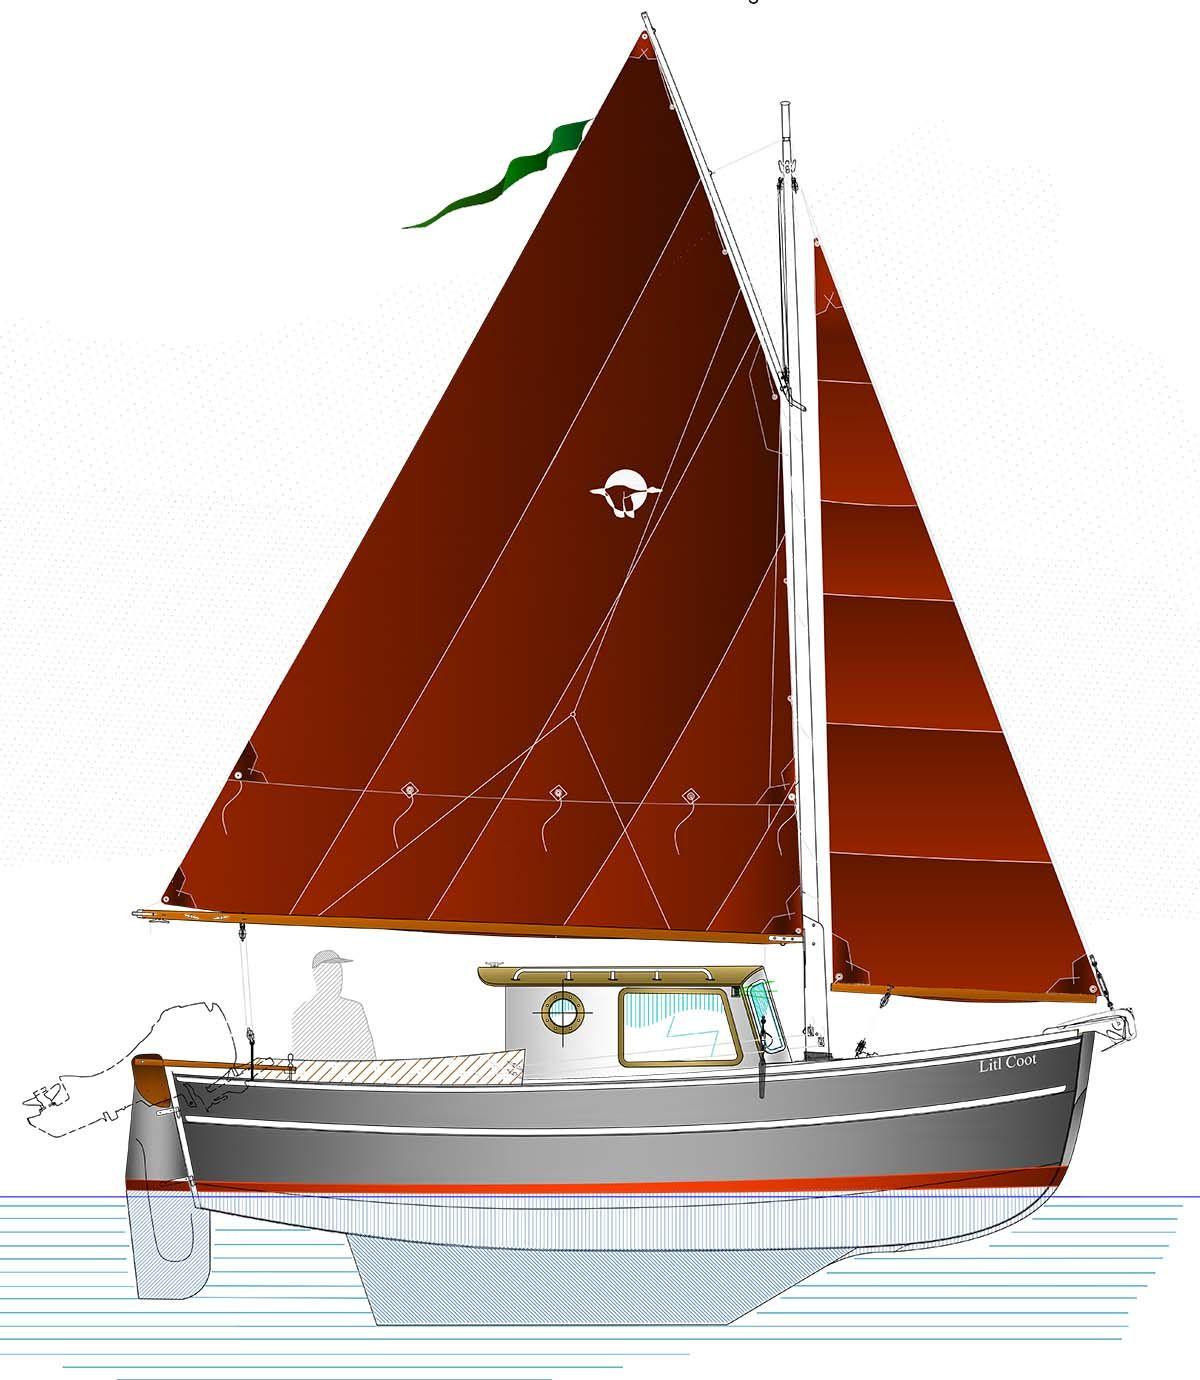 upea ilme toinen mahdollisuus melko mukava Catamaran Boat Plans Free | Boat design, Wooden boat plans, Boat